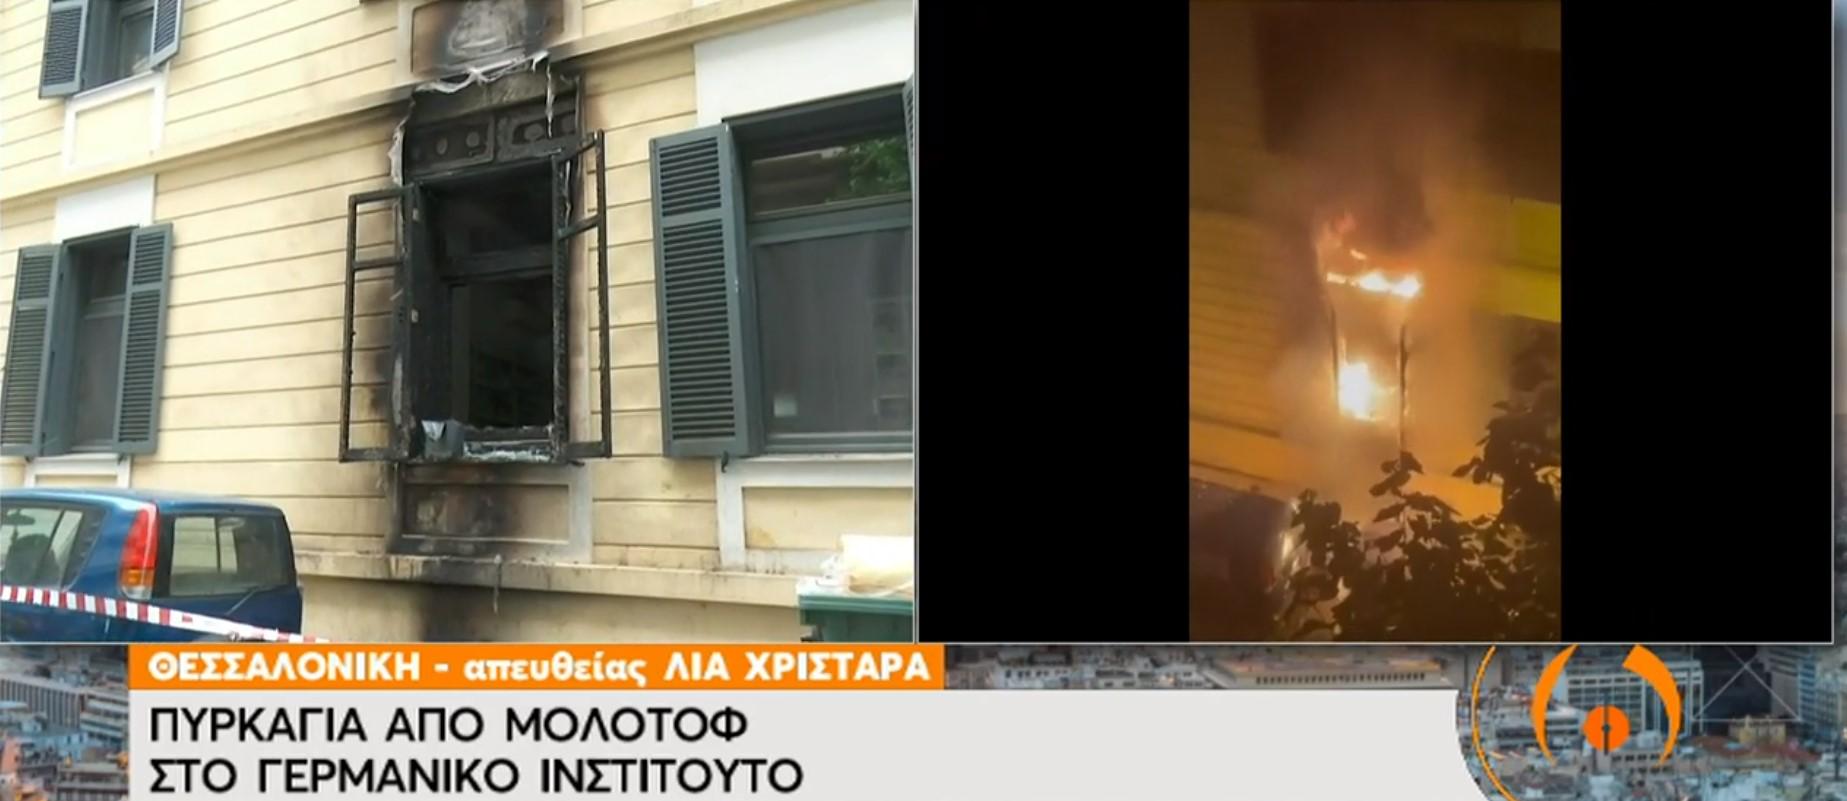 Goerhe Salonika Fire